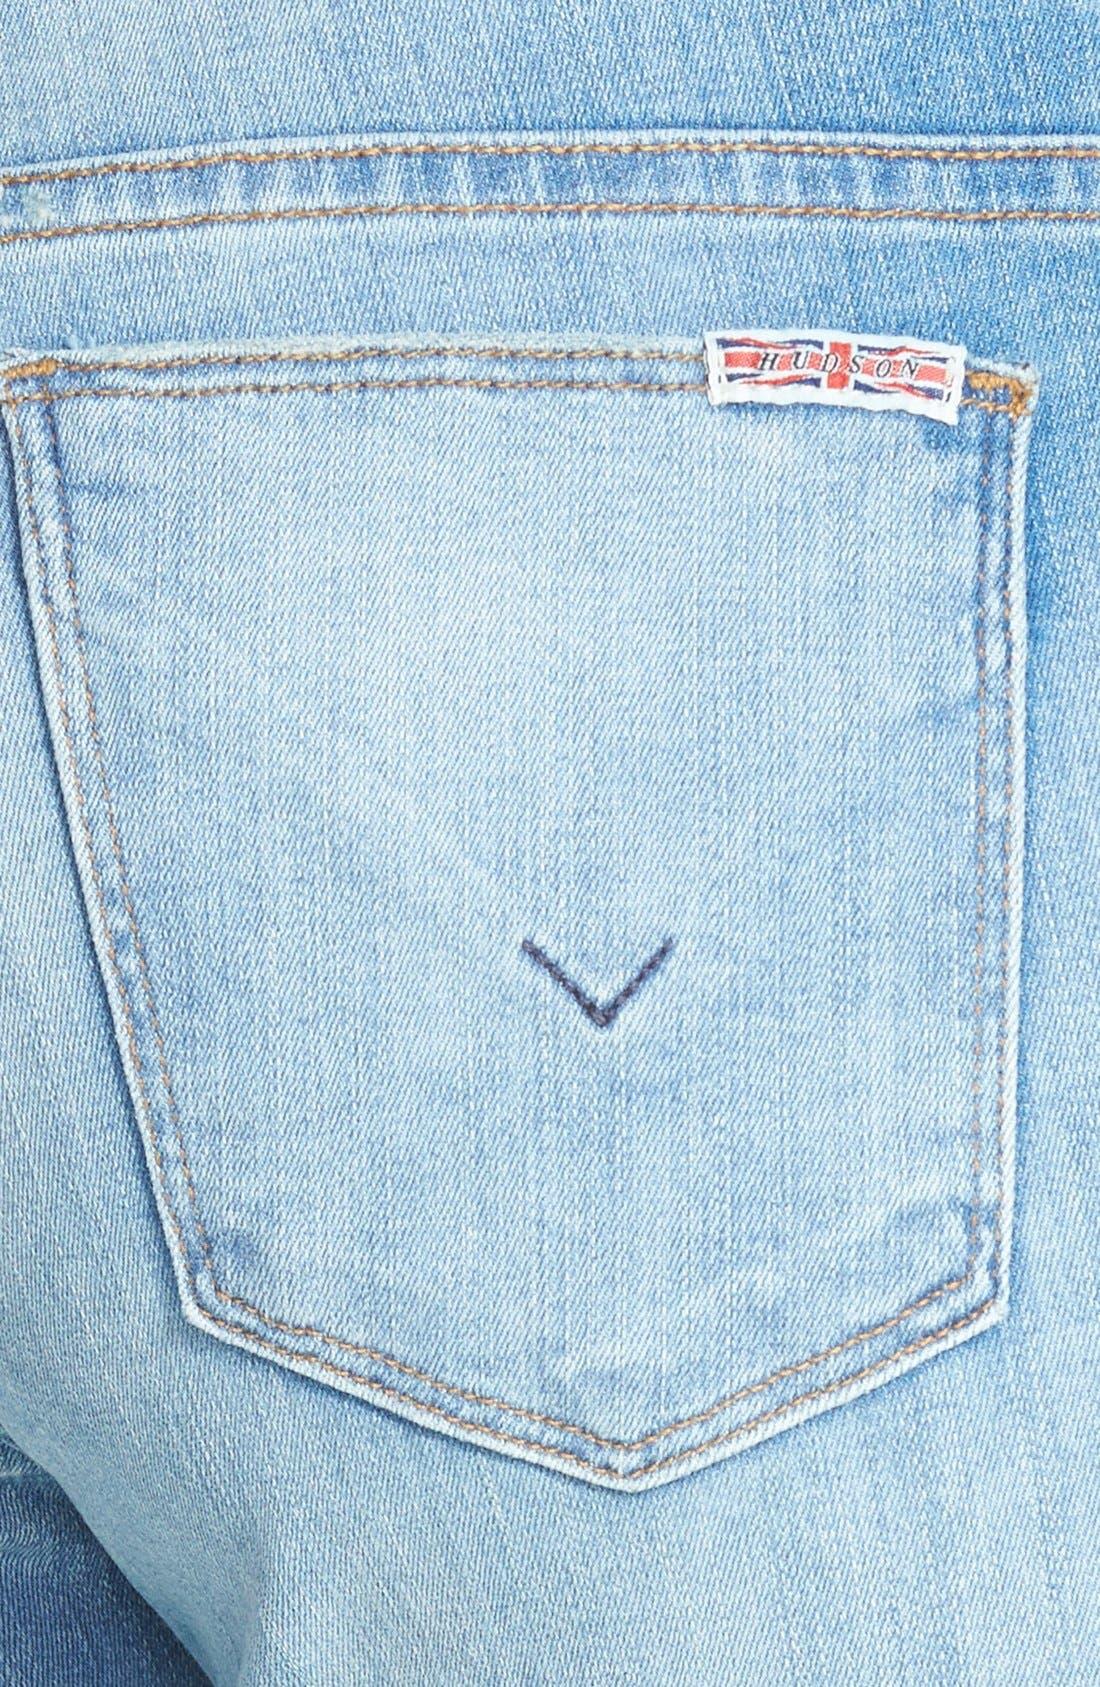 Alternate Image 3  - Hudson Jeans 'Krista' Super Skinny Jeans (Mischief)